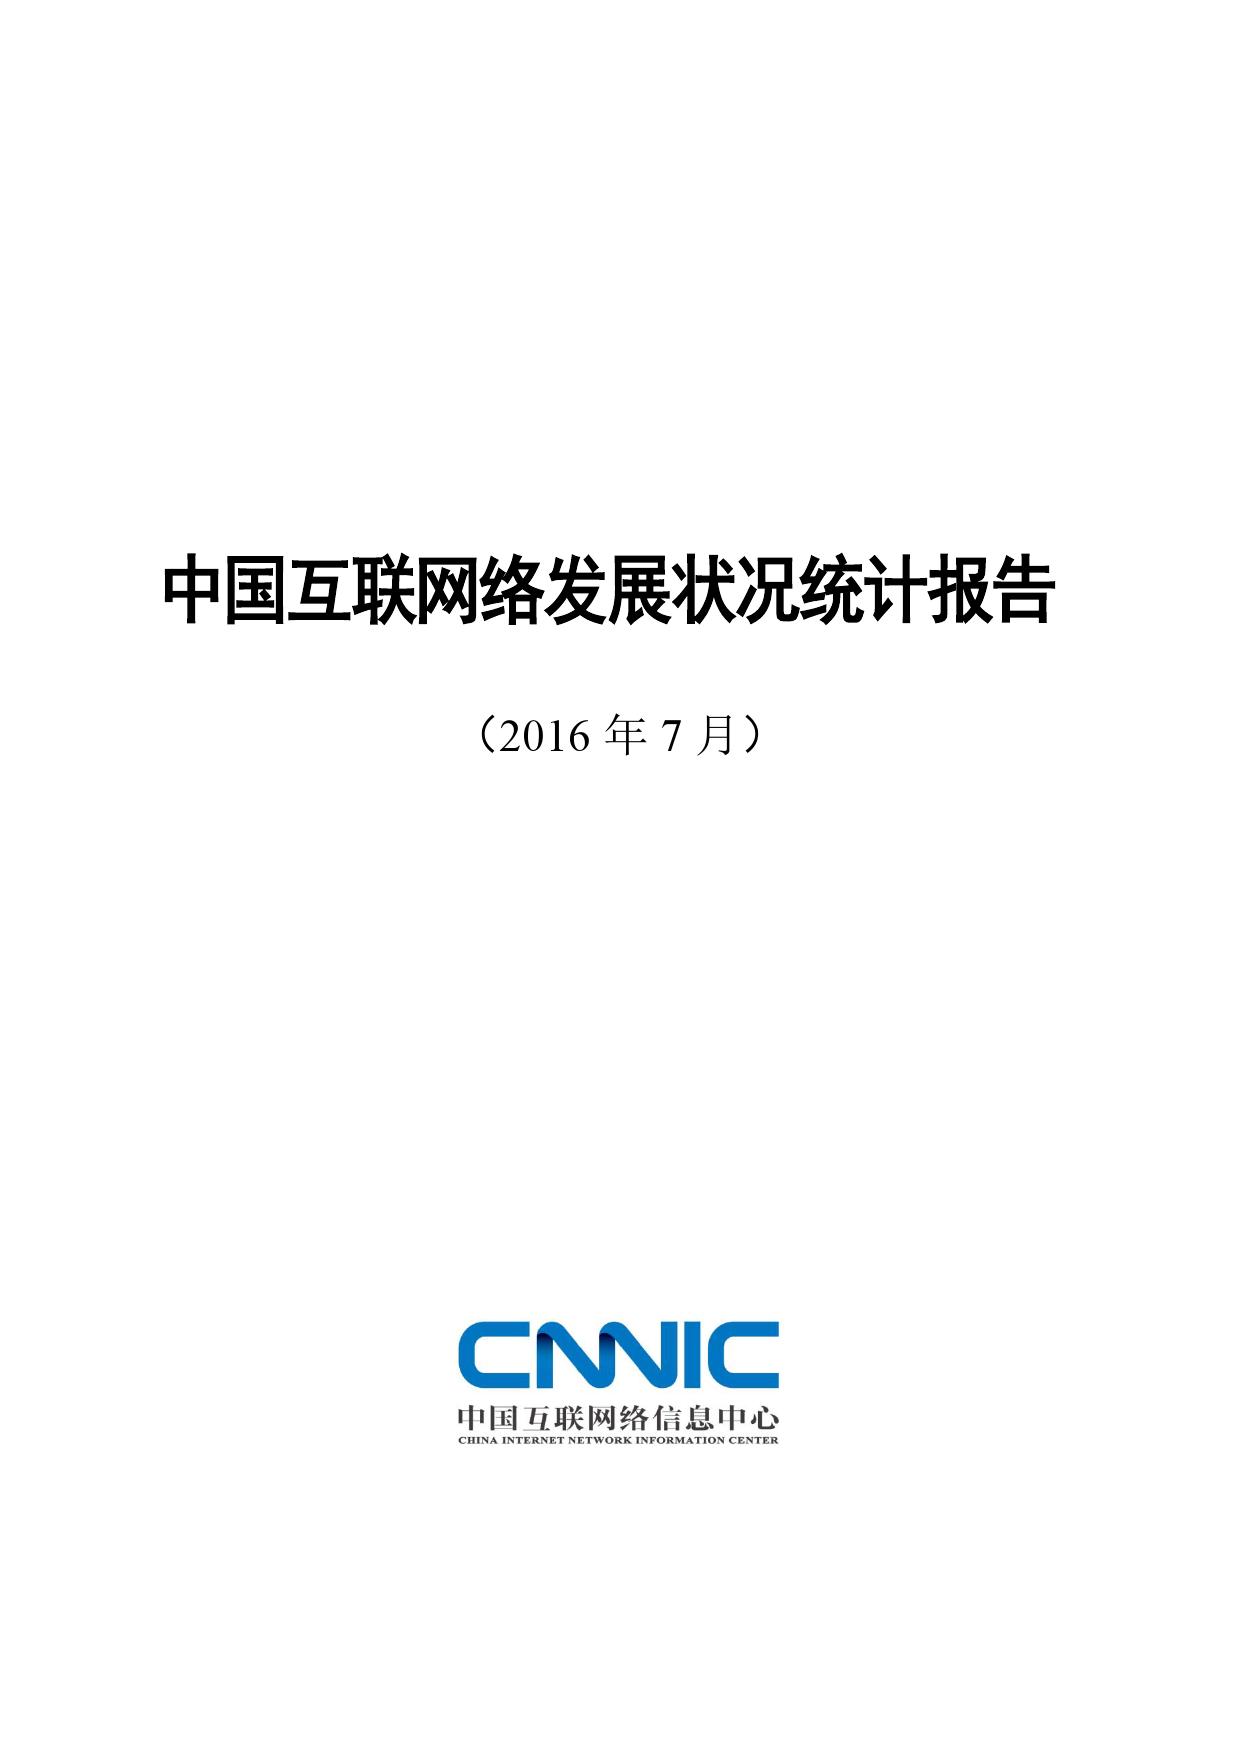 CNNIC:2015年第38次中国互联网络发展状况统计报告_000001